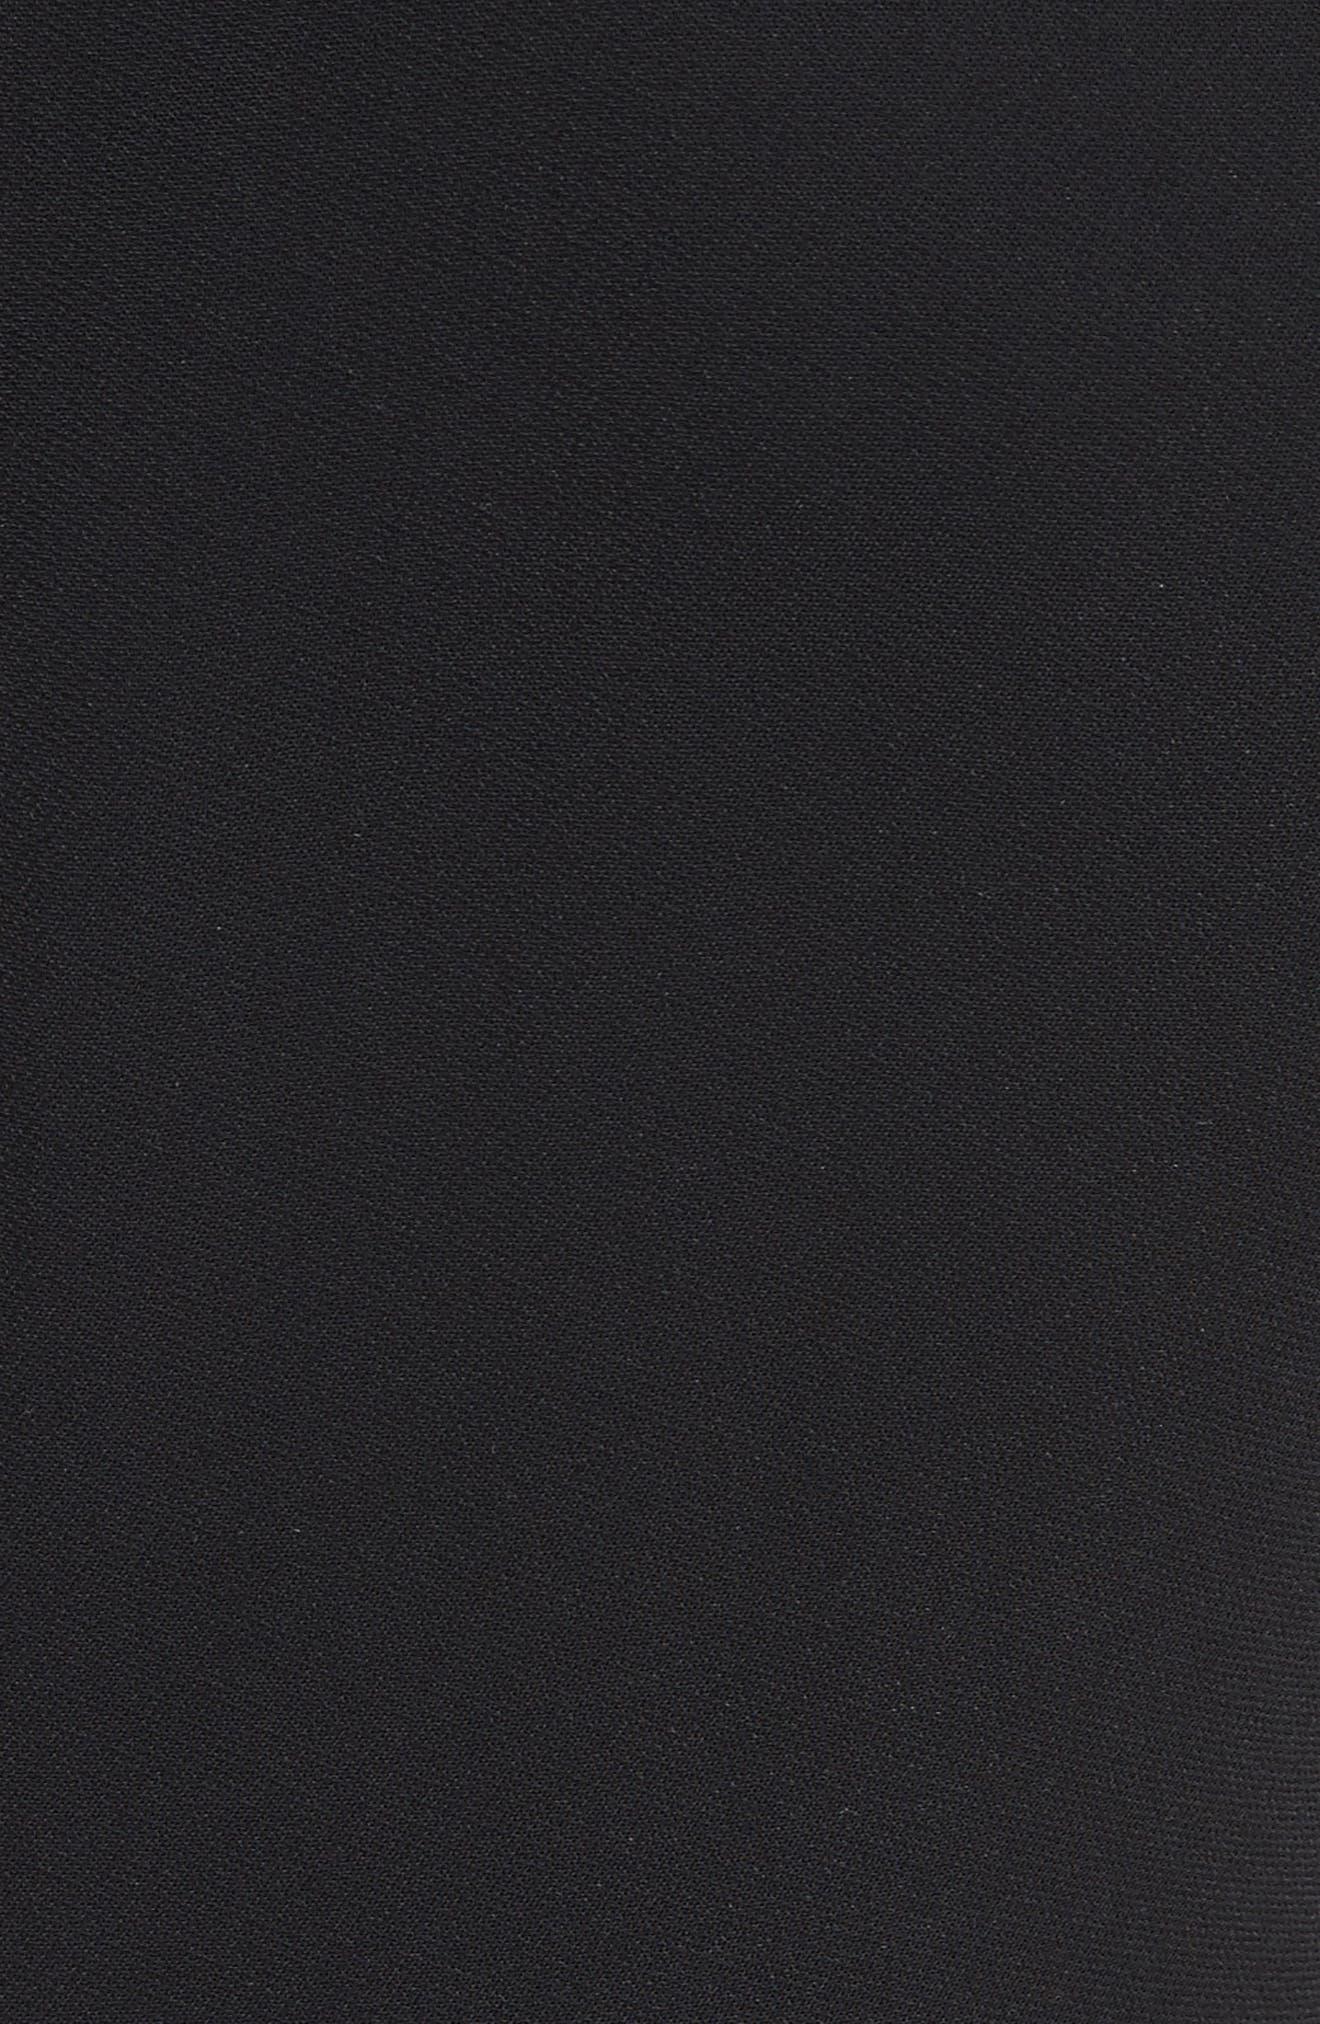 Benni Topstitched Midi Dress,                             Alternate thumbnail 5, color,                             001